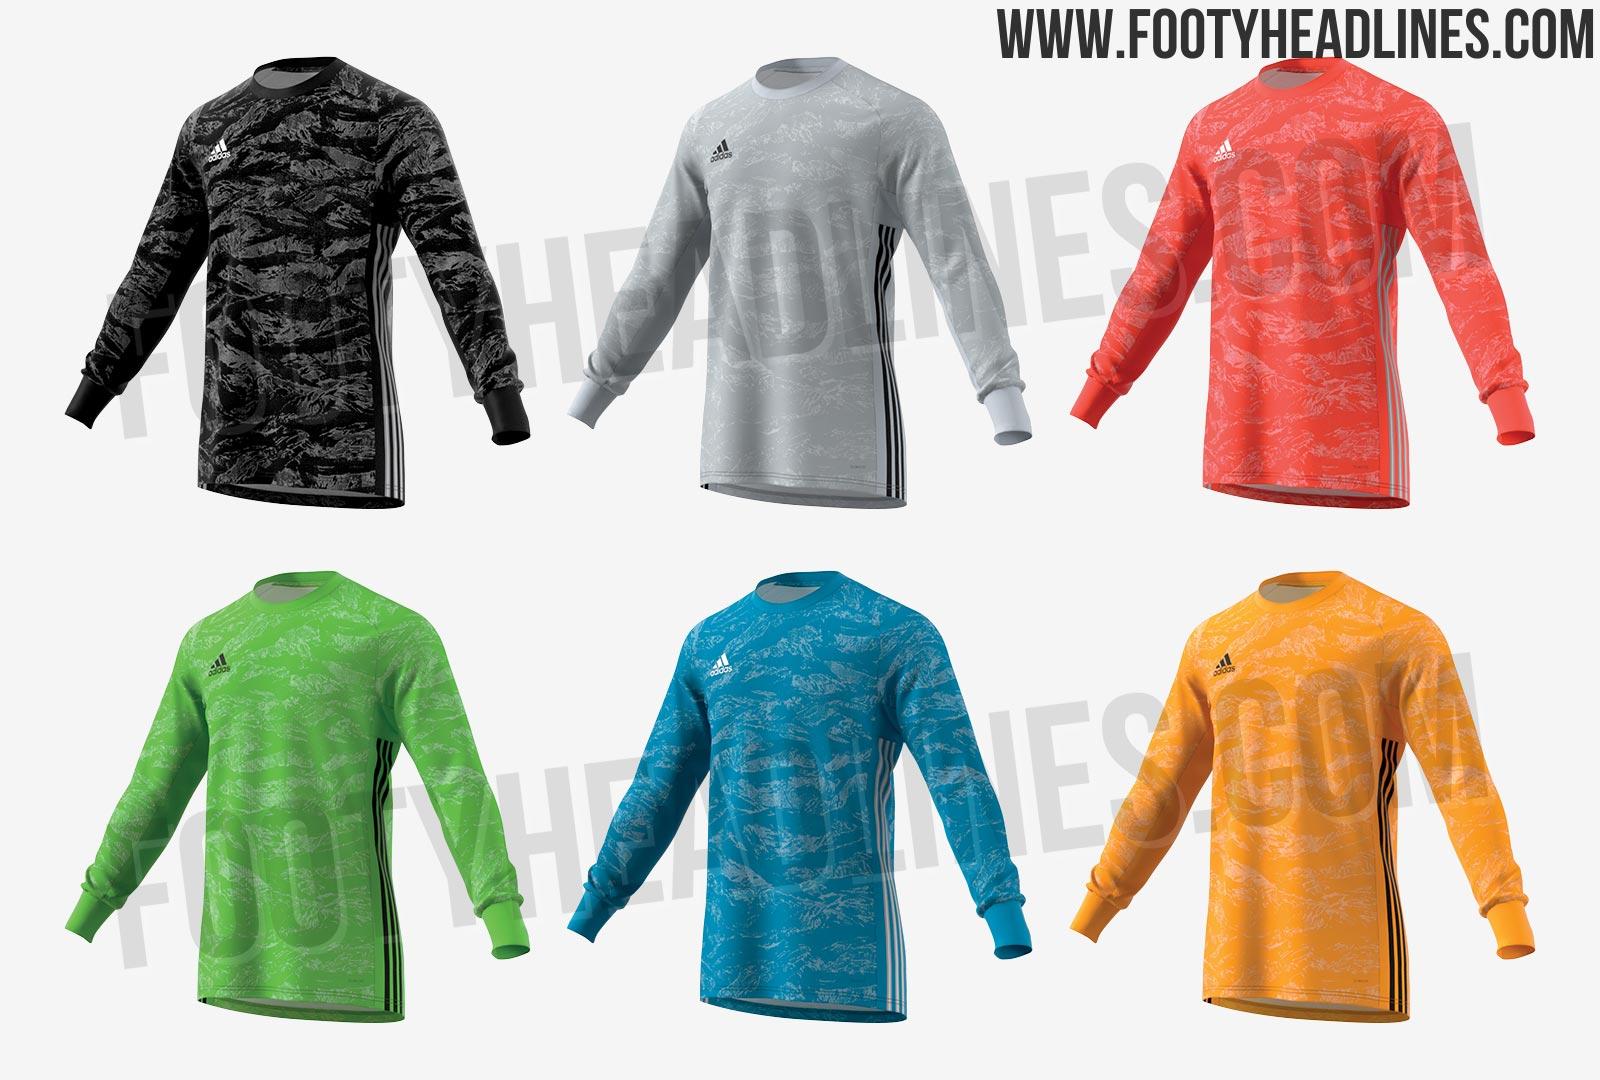 adidas goalkeeper kits jersey on sale